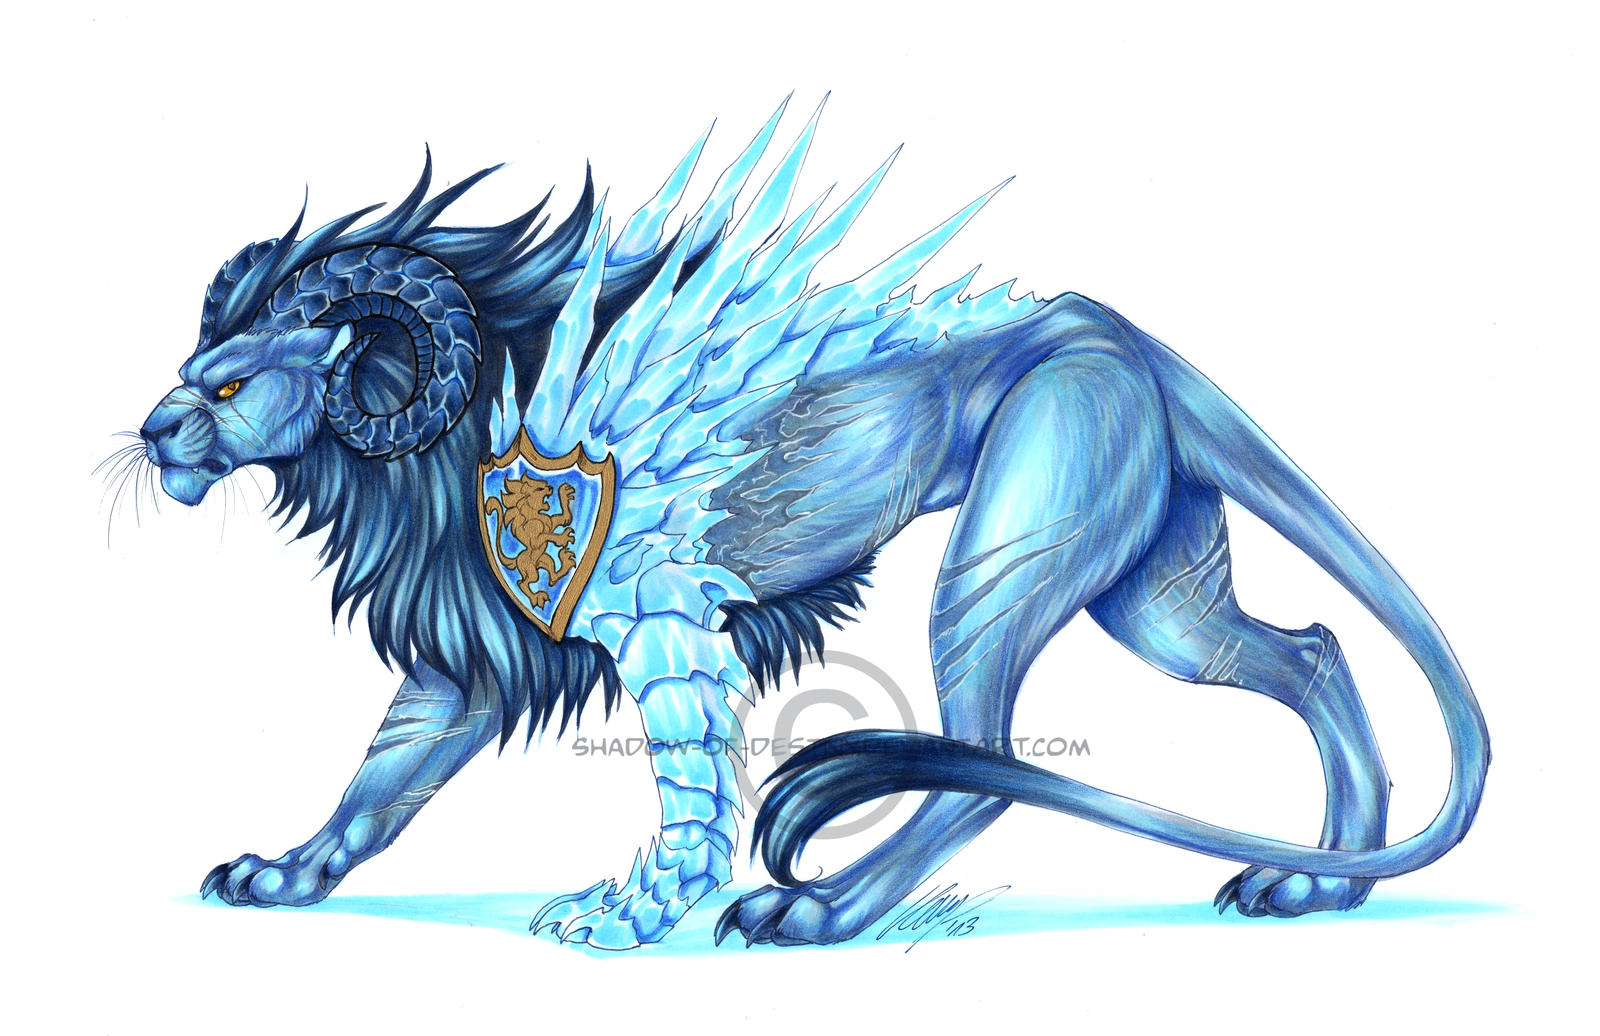 c ice lion by shadowofdestiny on deviantart